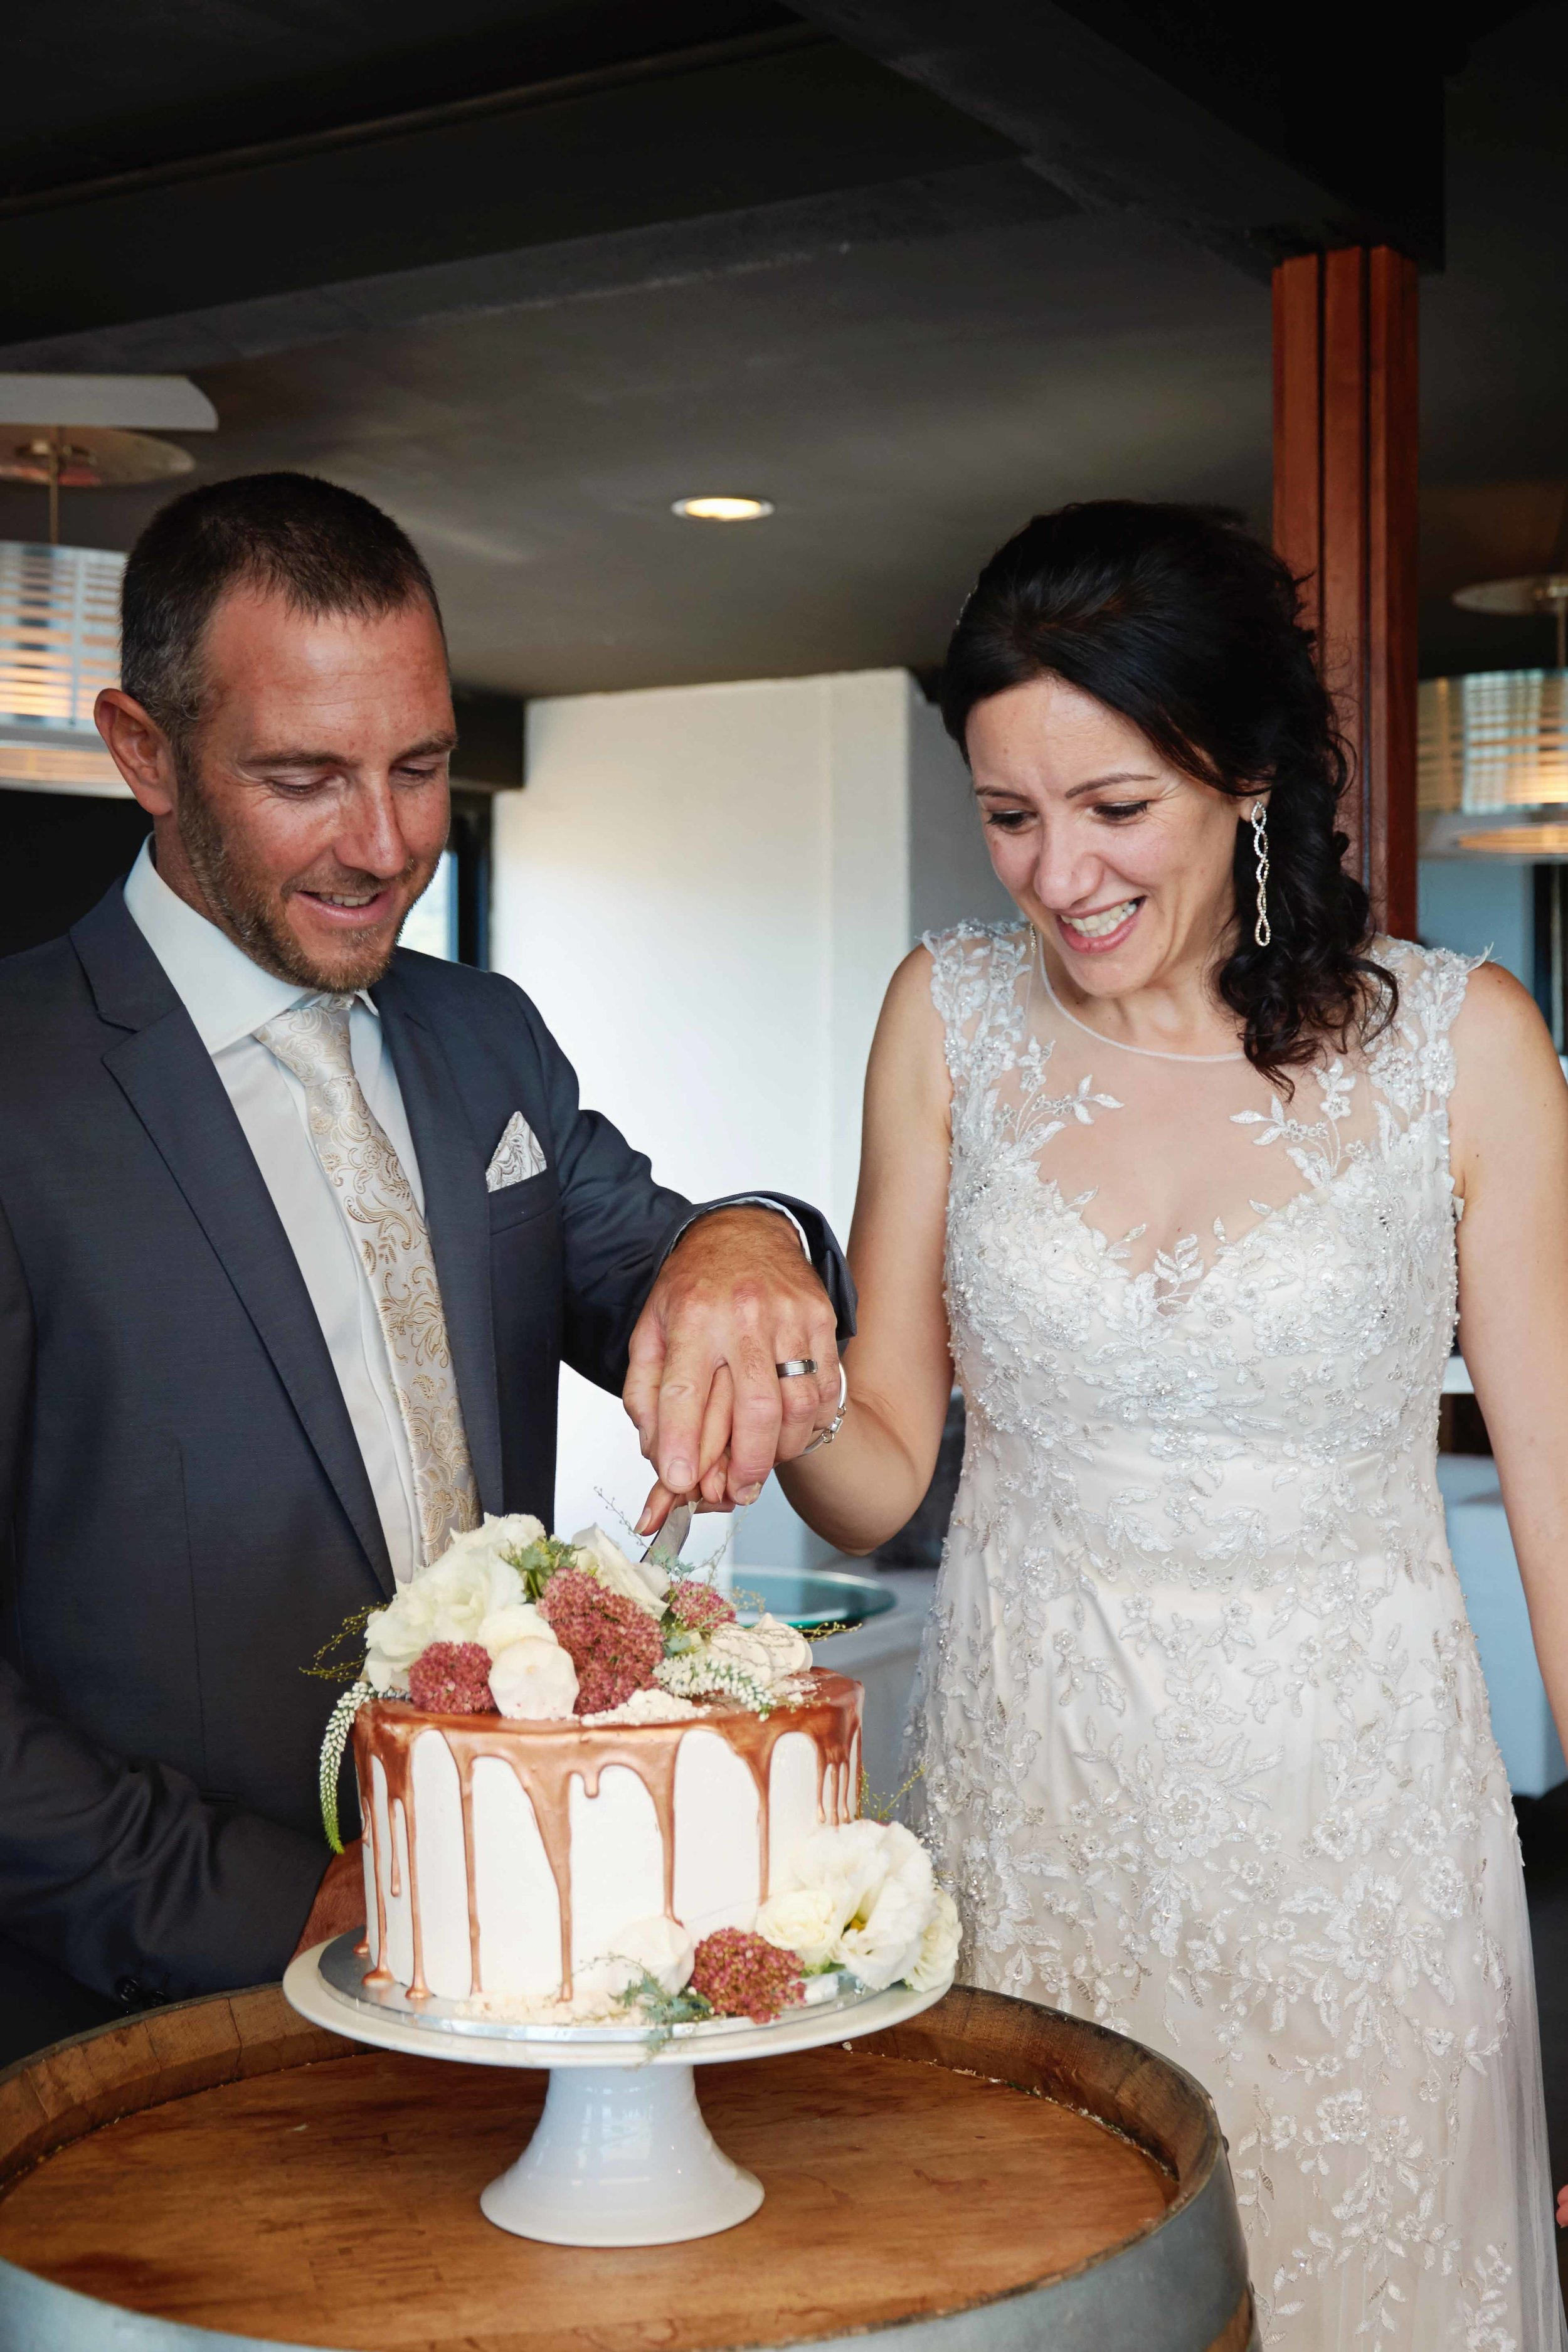 sorrento-wedding-photography-all-smiles-marissa-jade-photography-102.jpg